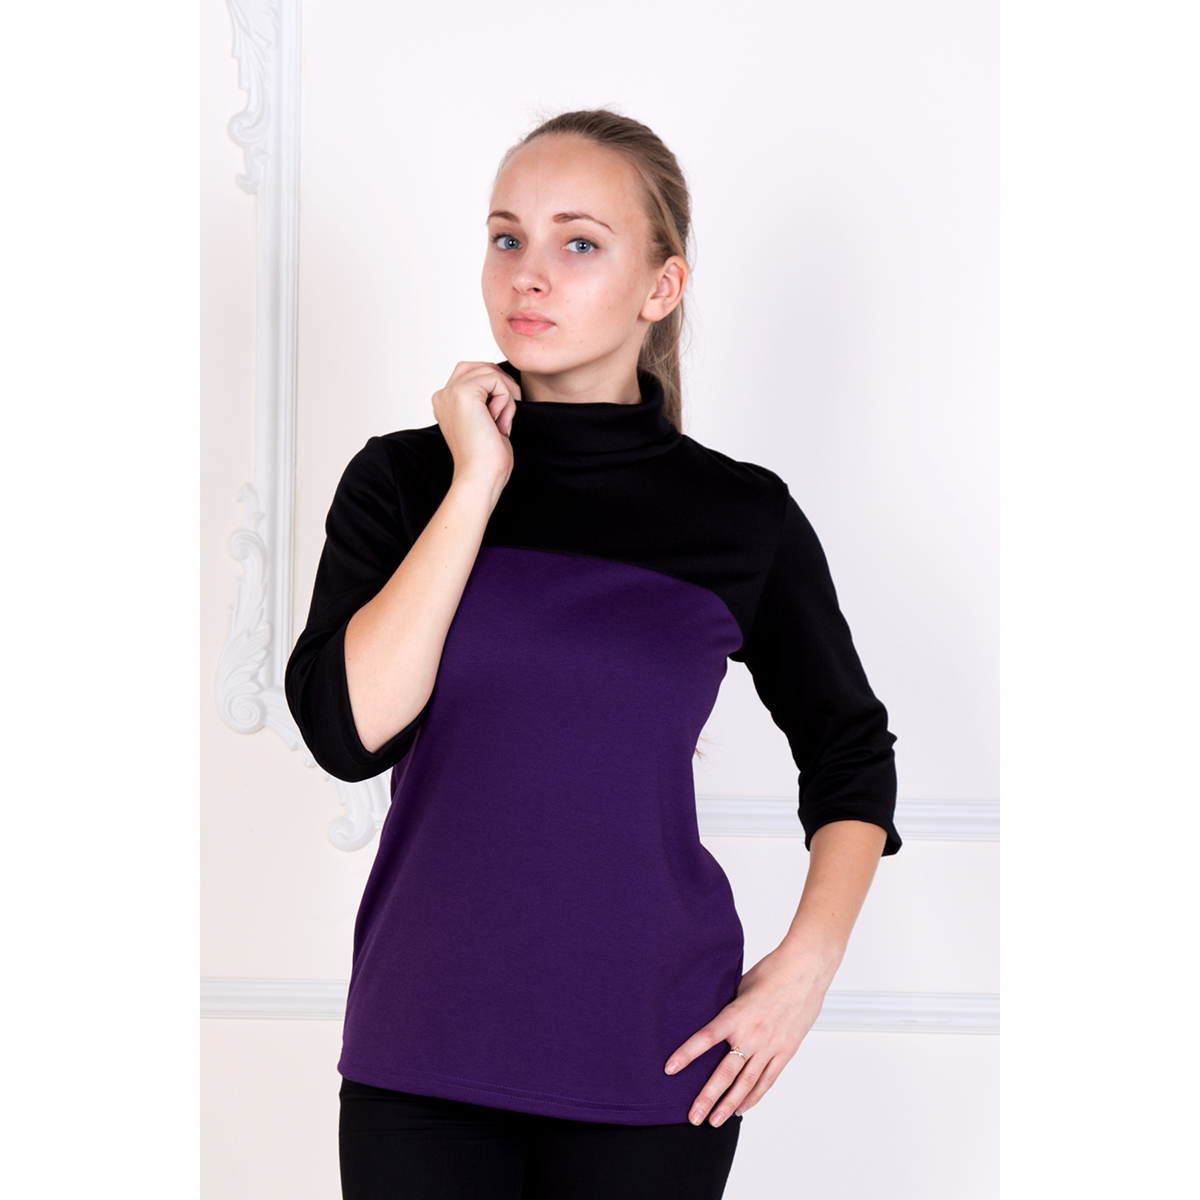 Женская блуза Сити, размер 48Блузы<br>Обхват груди: 96 см <br>Обхват талии: 78 см <br>Обхват бедер: 104 см <br>Рост: 167 см<br><br>Тип: Жен. блуза<br>Размер: 48<br>Материал: Милано